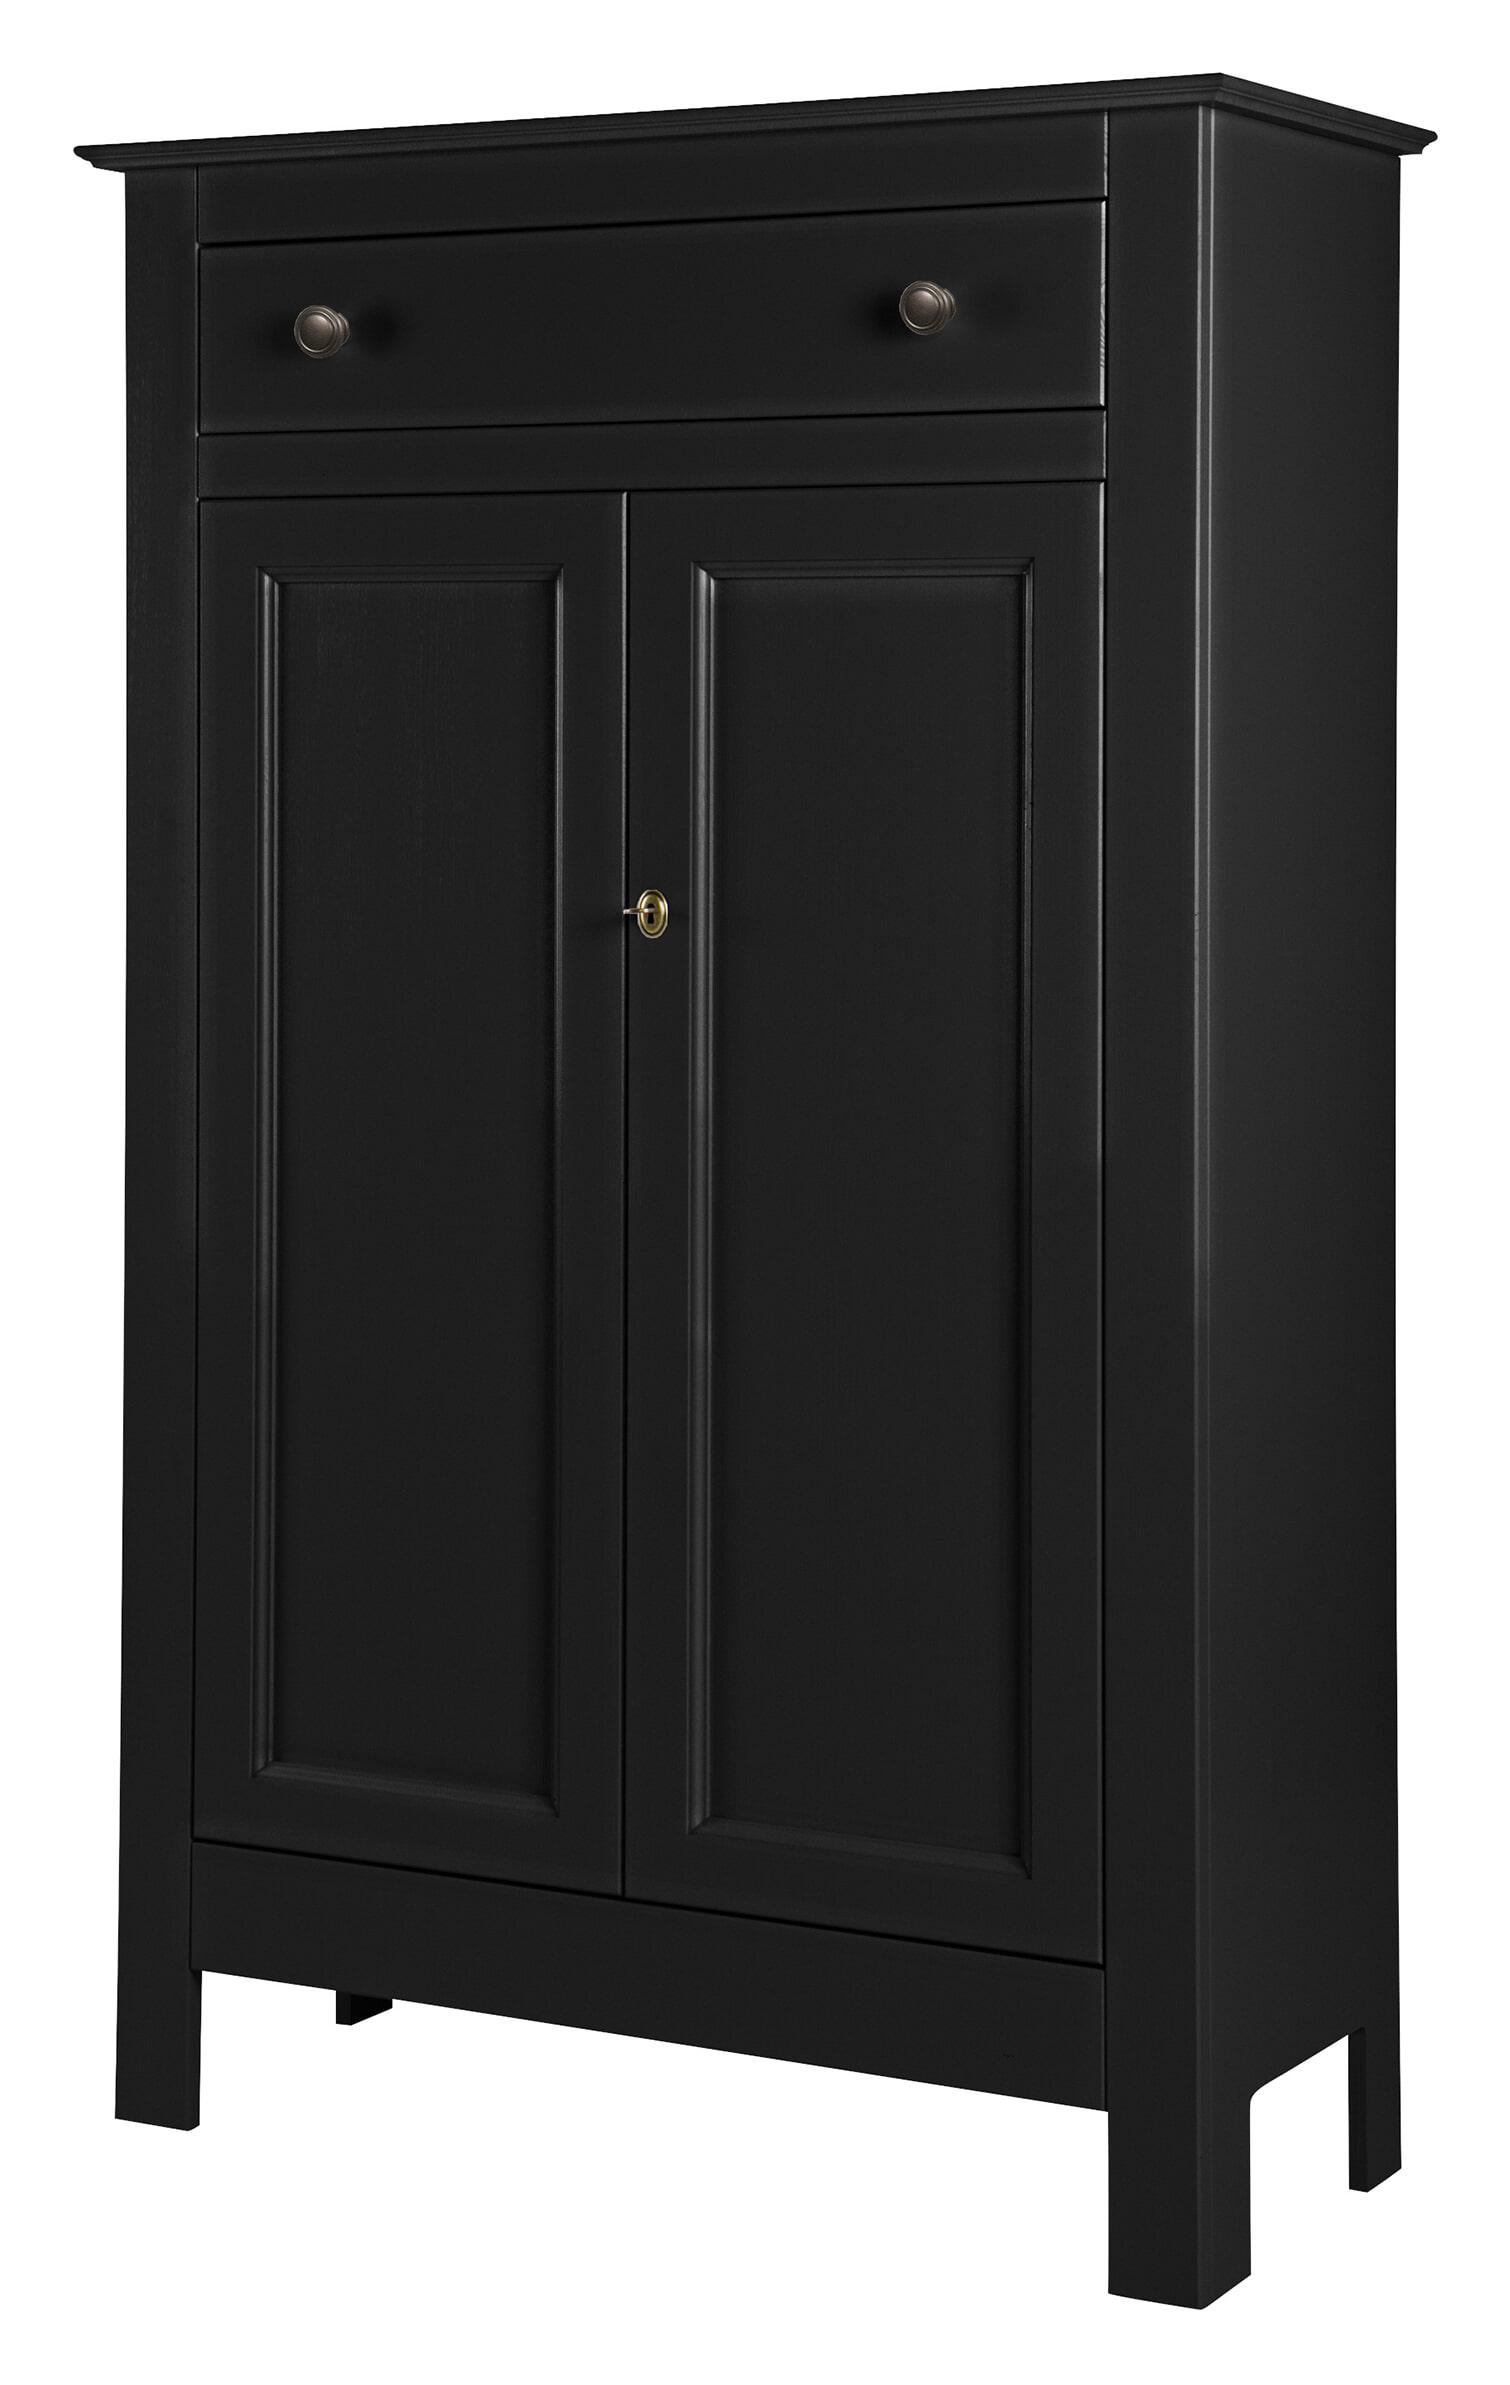 WOOOD Opbergkast Eva 150 x 93cm, kleur Zwart